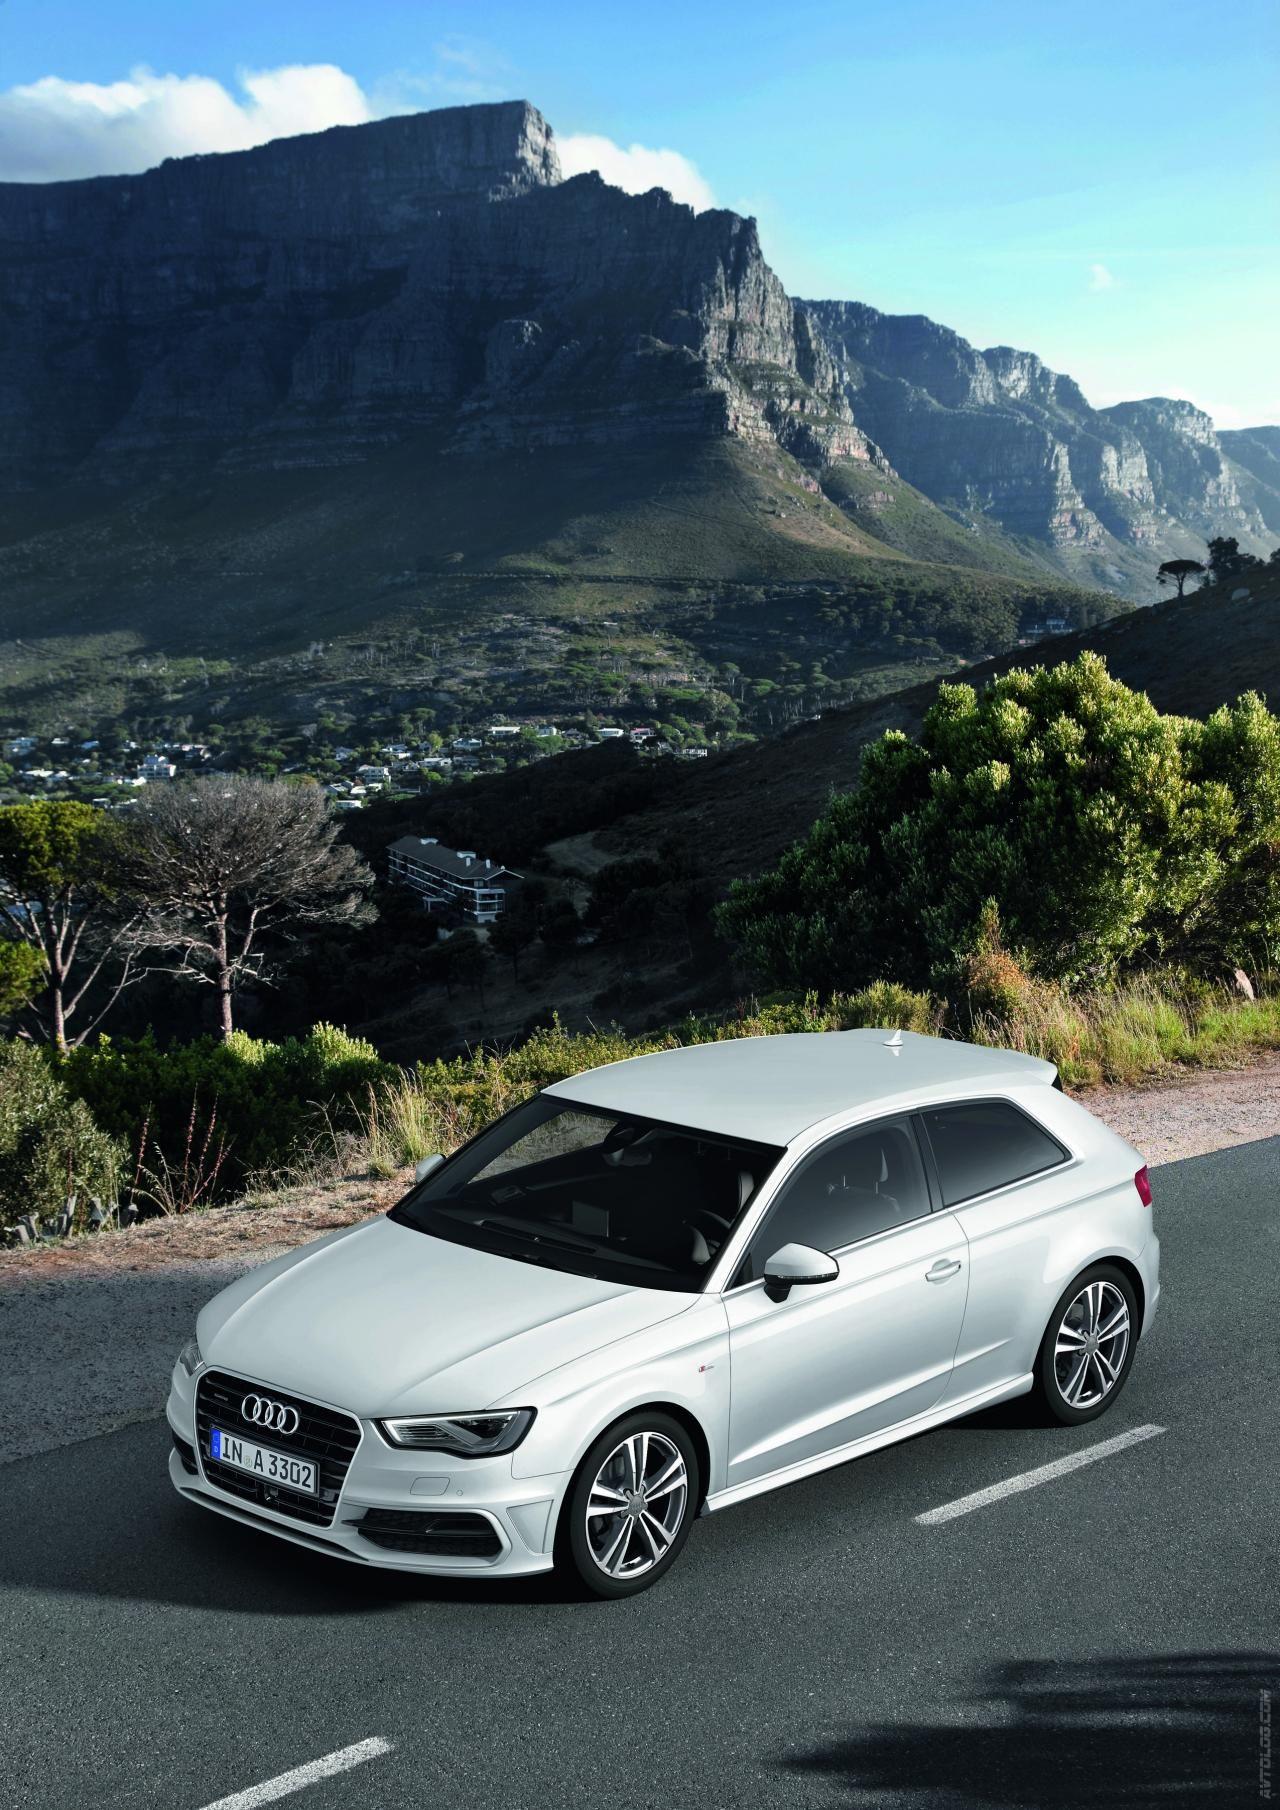 2012 Audi A3 S line Audi Pinterest